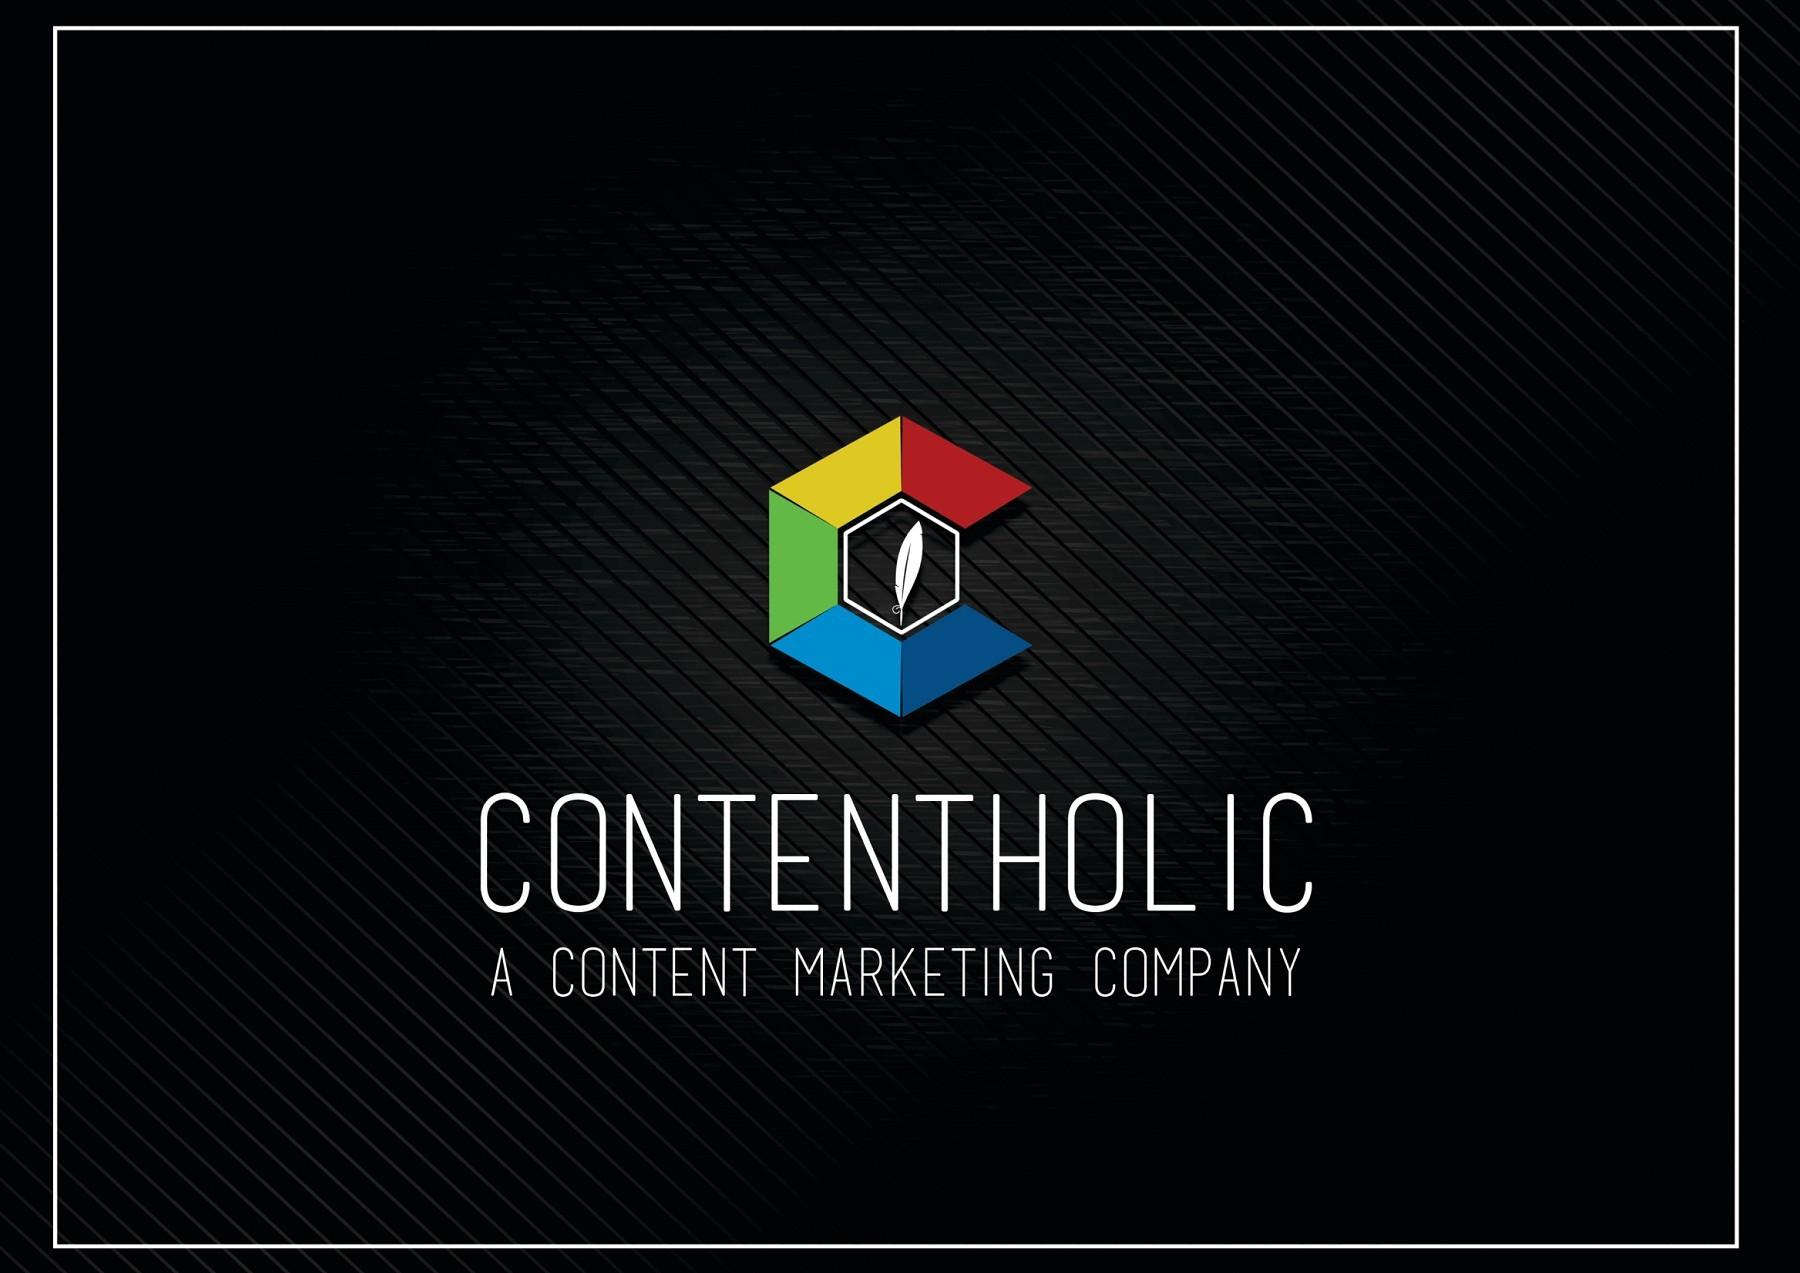 Contentholic